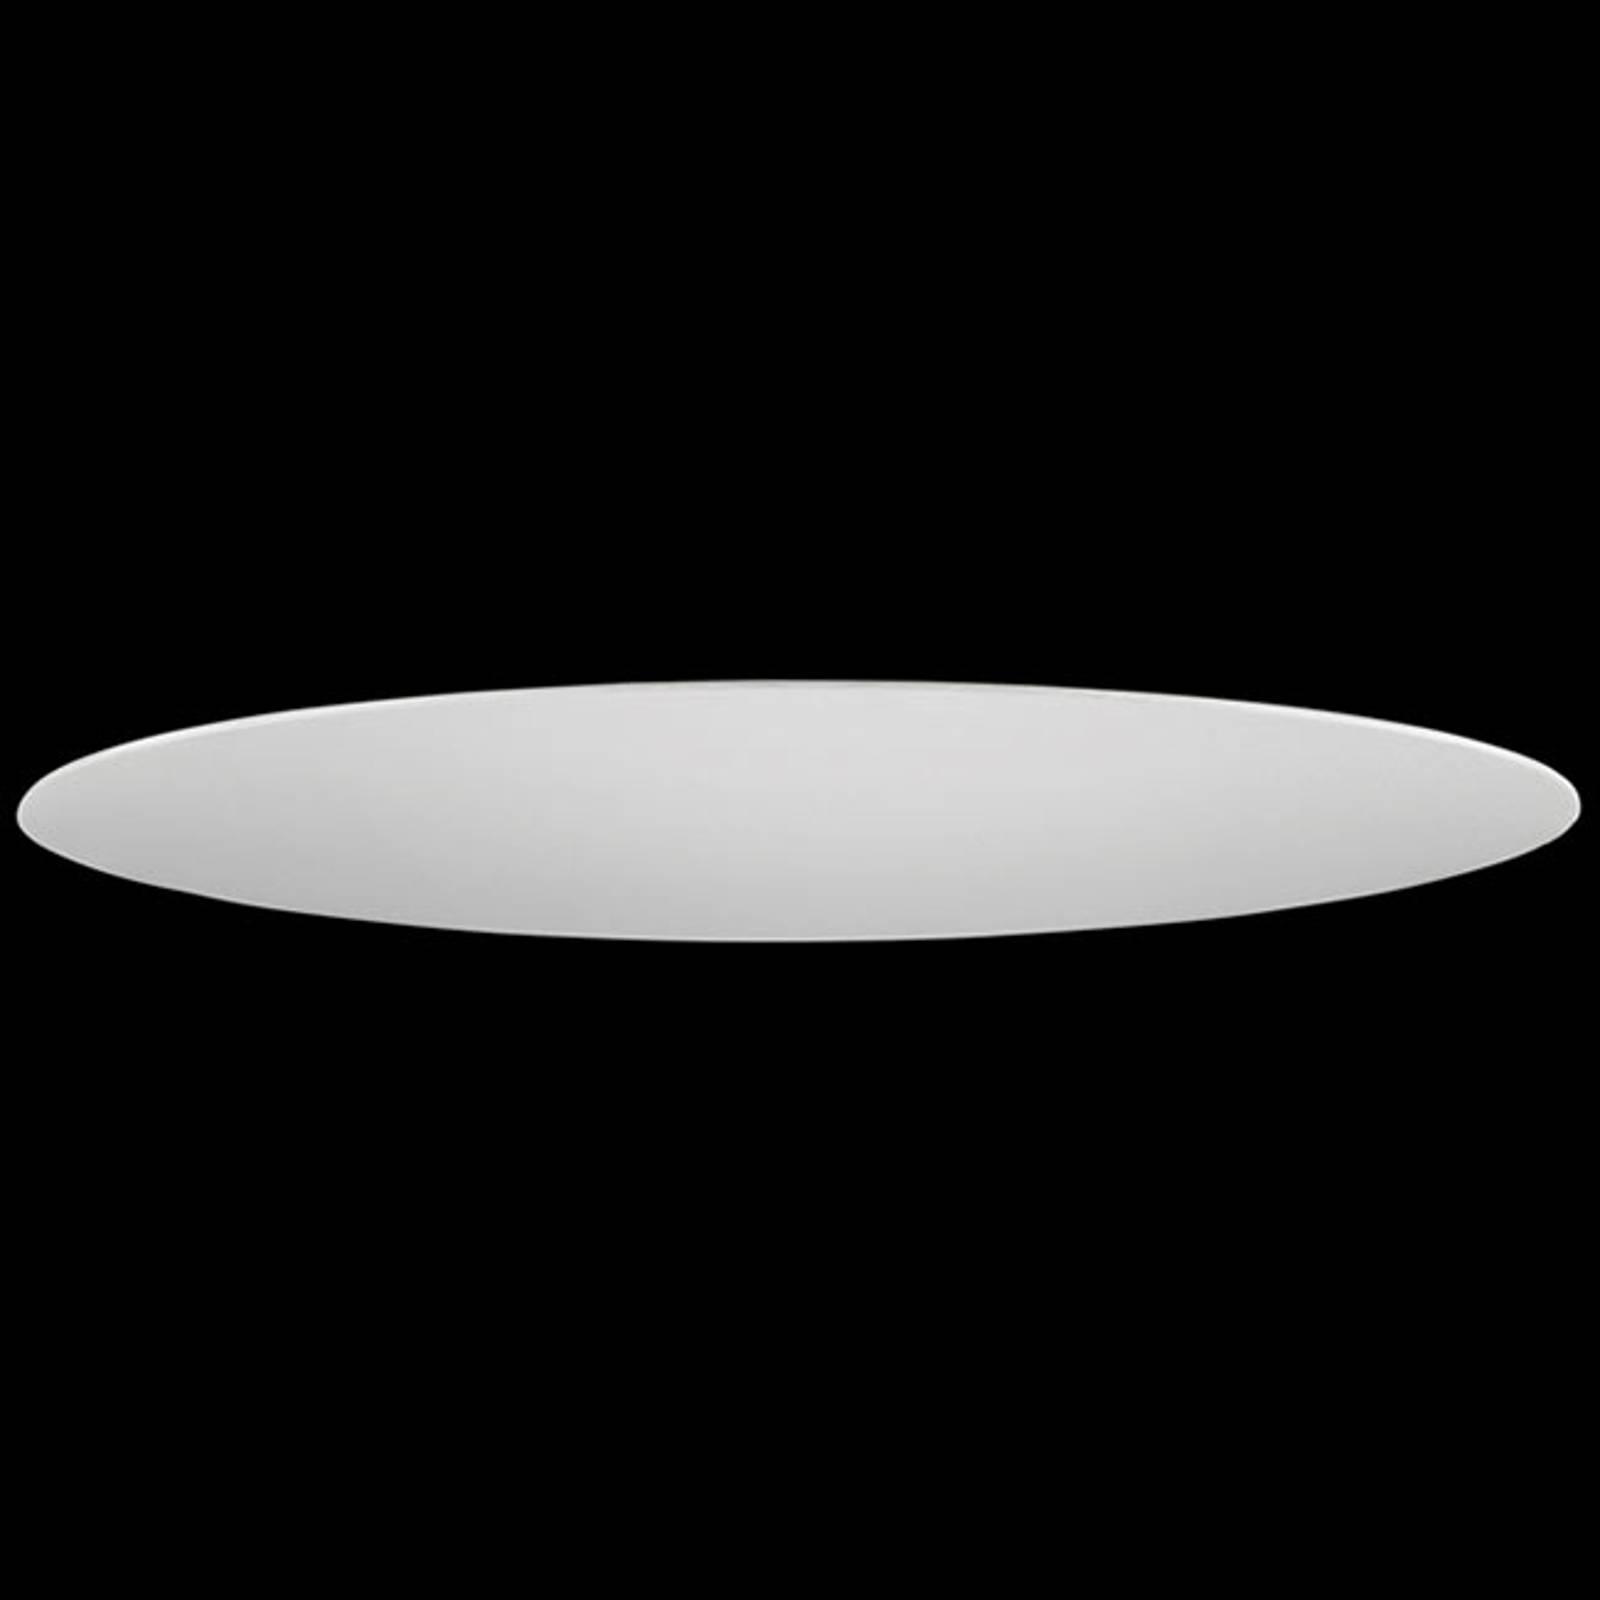 Varjostin, HV-Track 4, Ø 40 cm creme